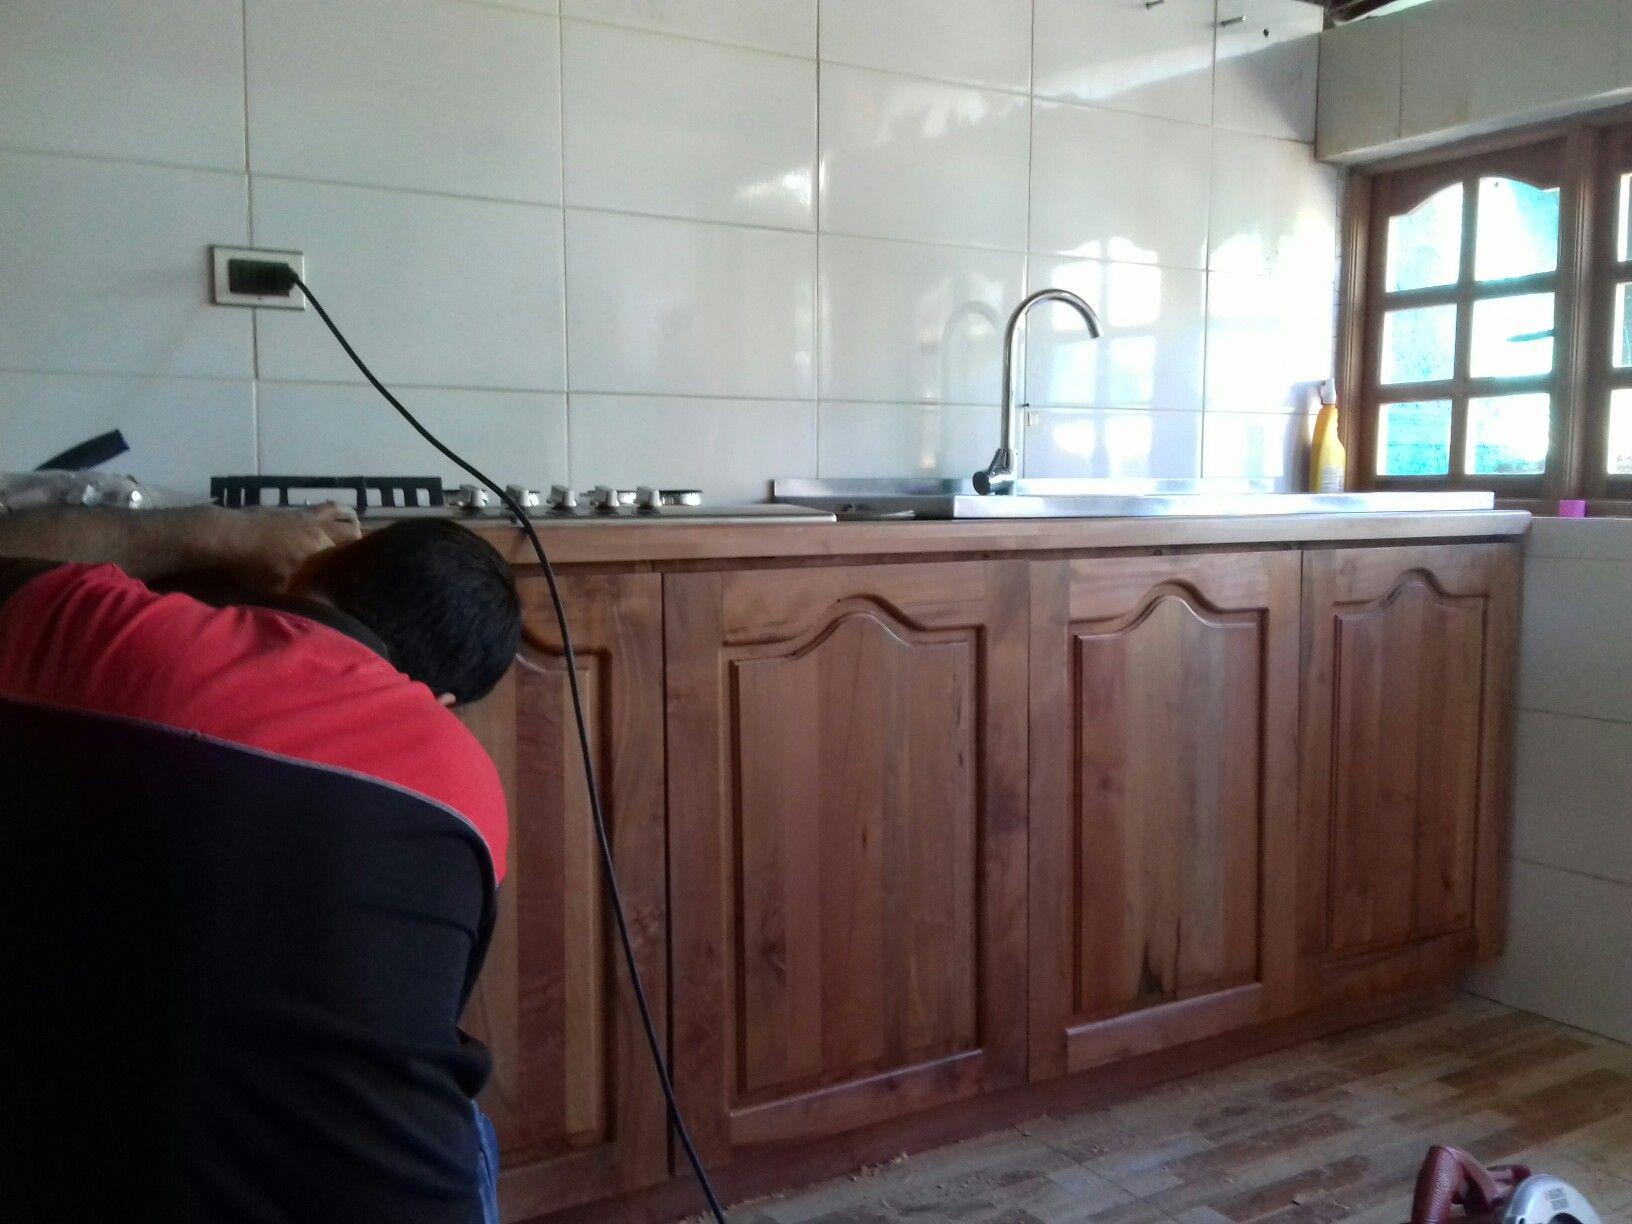 Pin de TerraMadera en Cocina en madera solida | Pinterest | Madera y ...